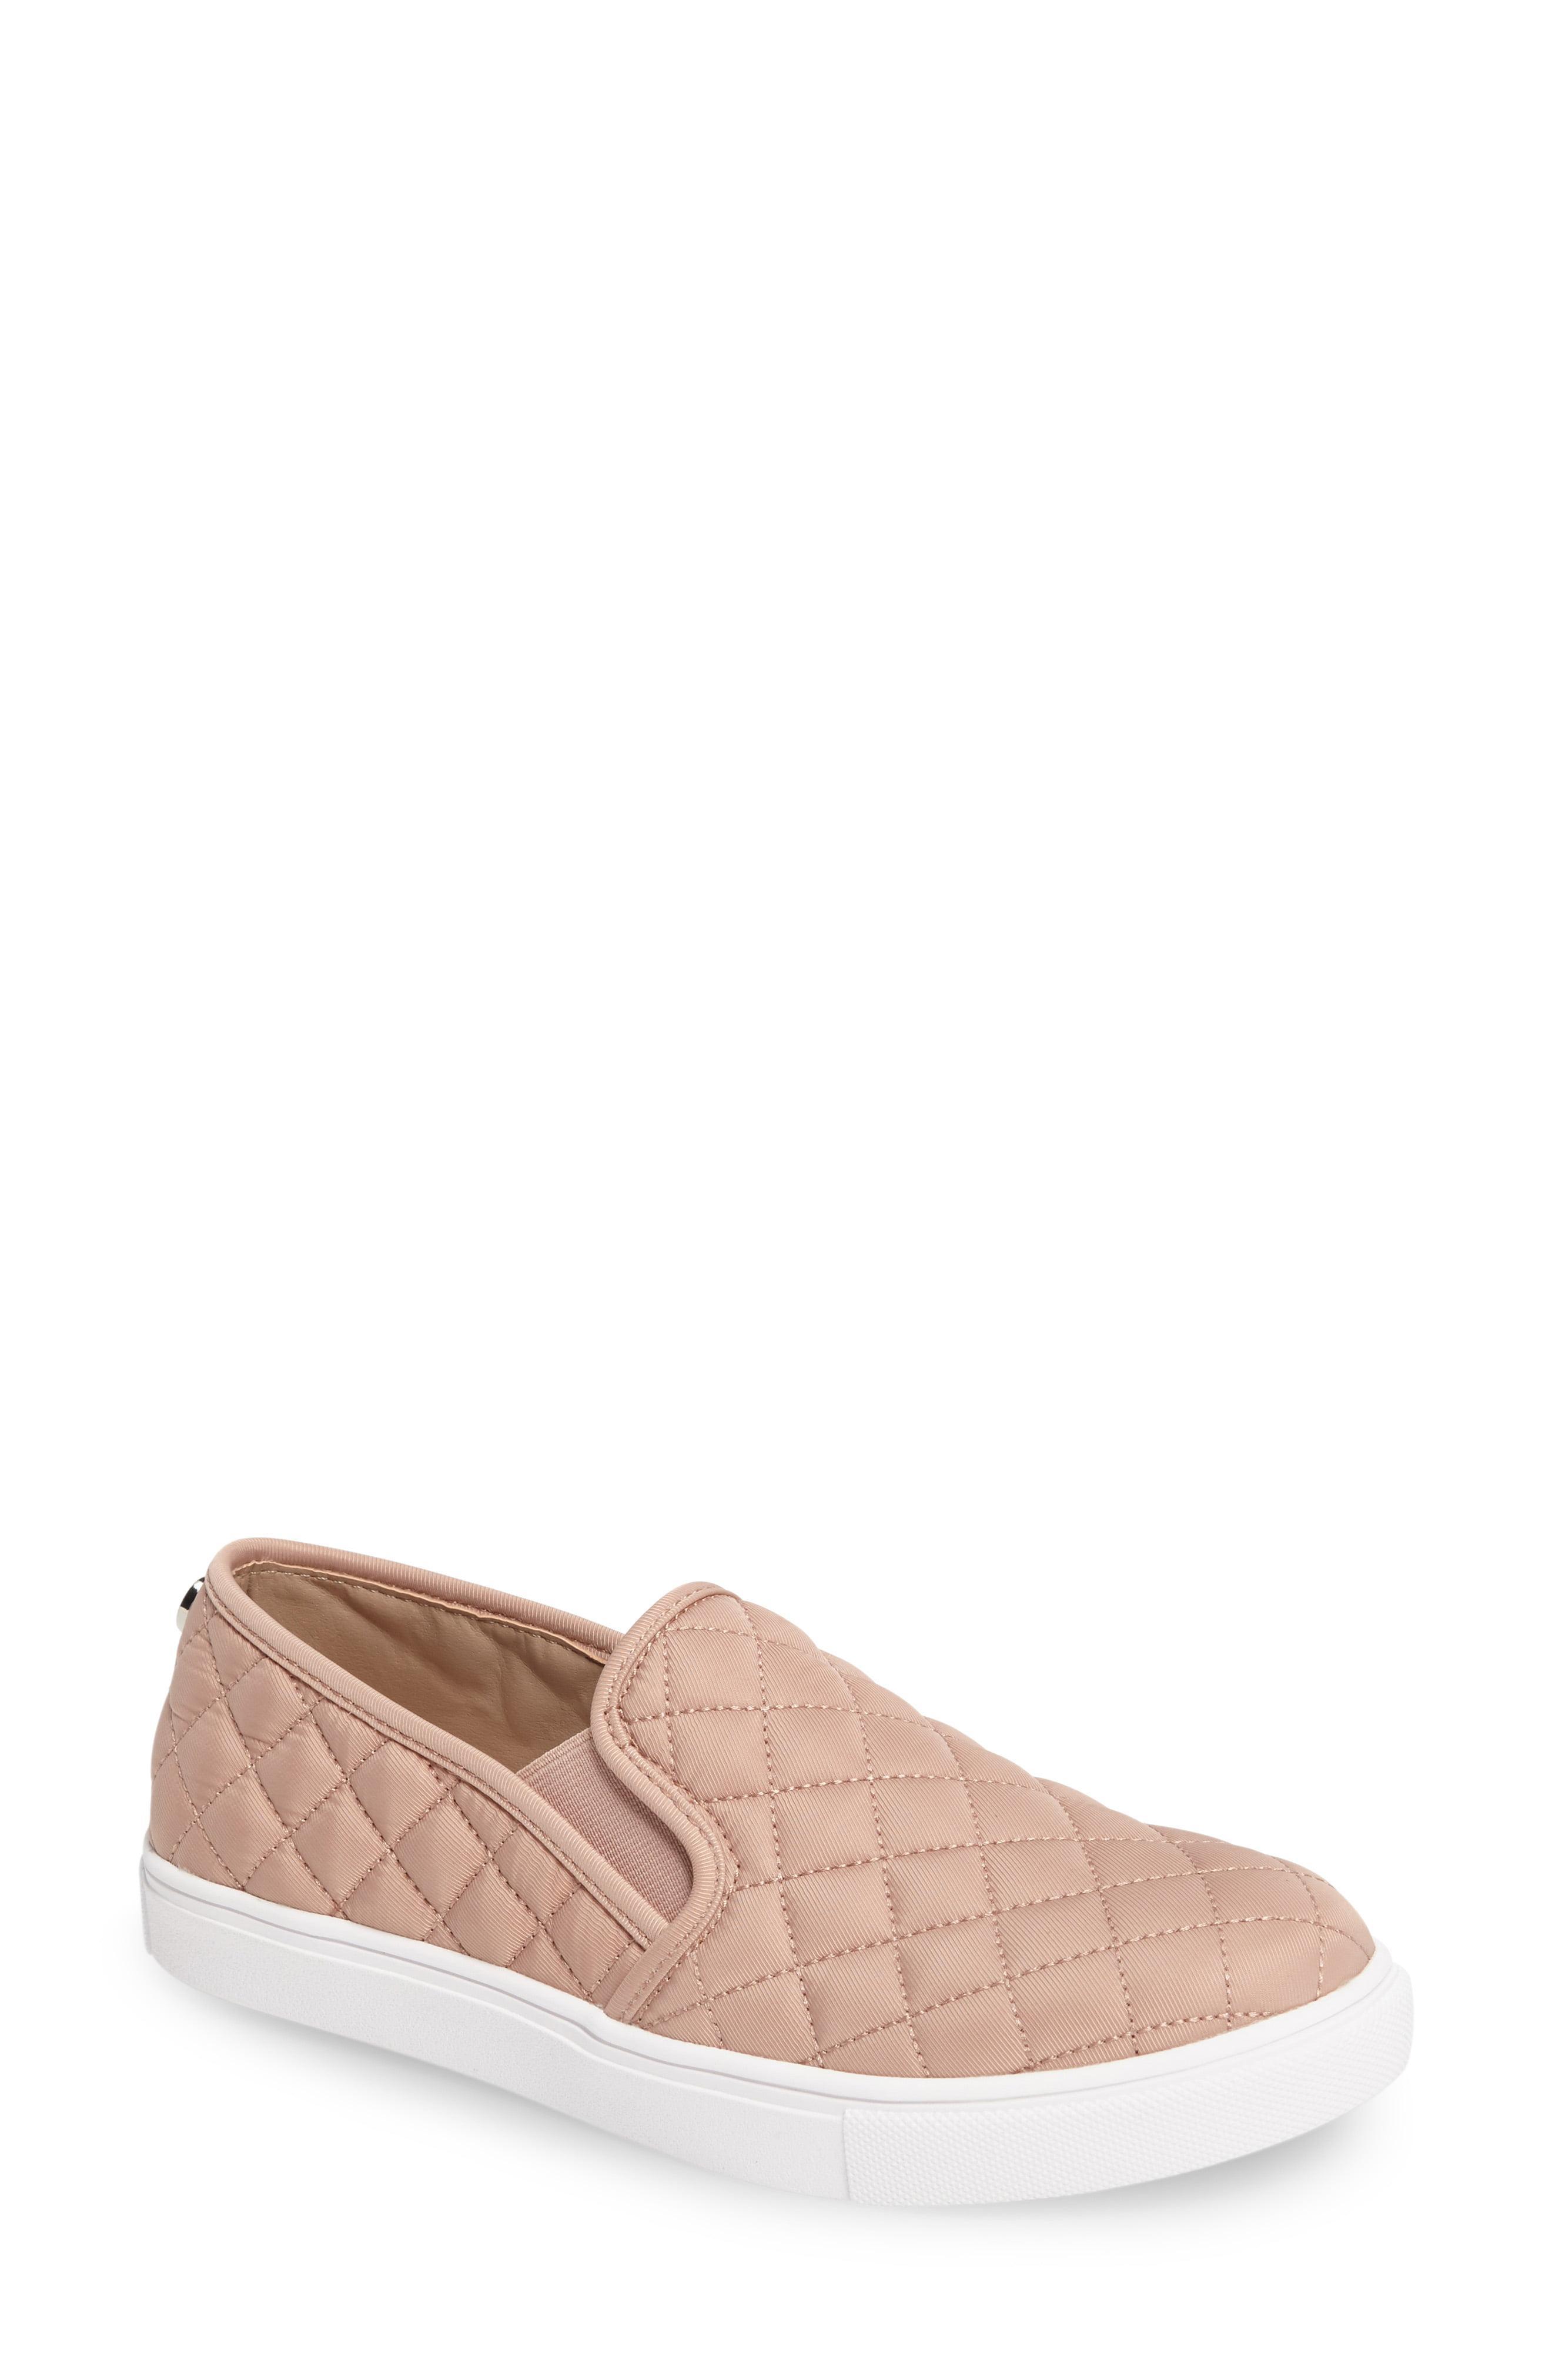 68854326e5d Lyst - Steve Madden  ecntrcqt  Sneaker